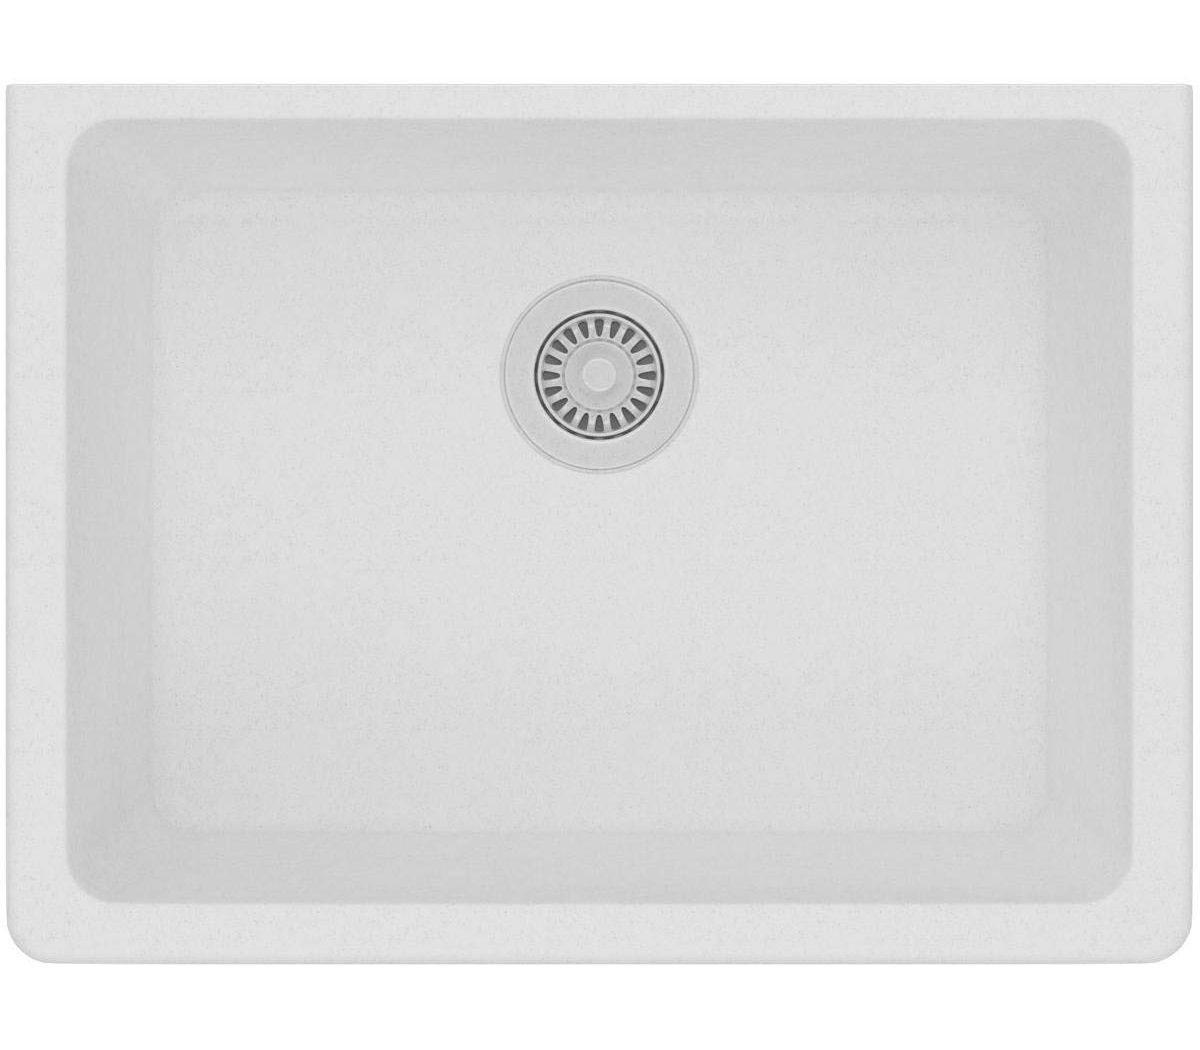 Quartz Classic Single Bowl Undermount Sink By Elkay Review